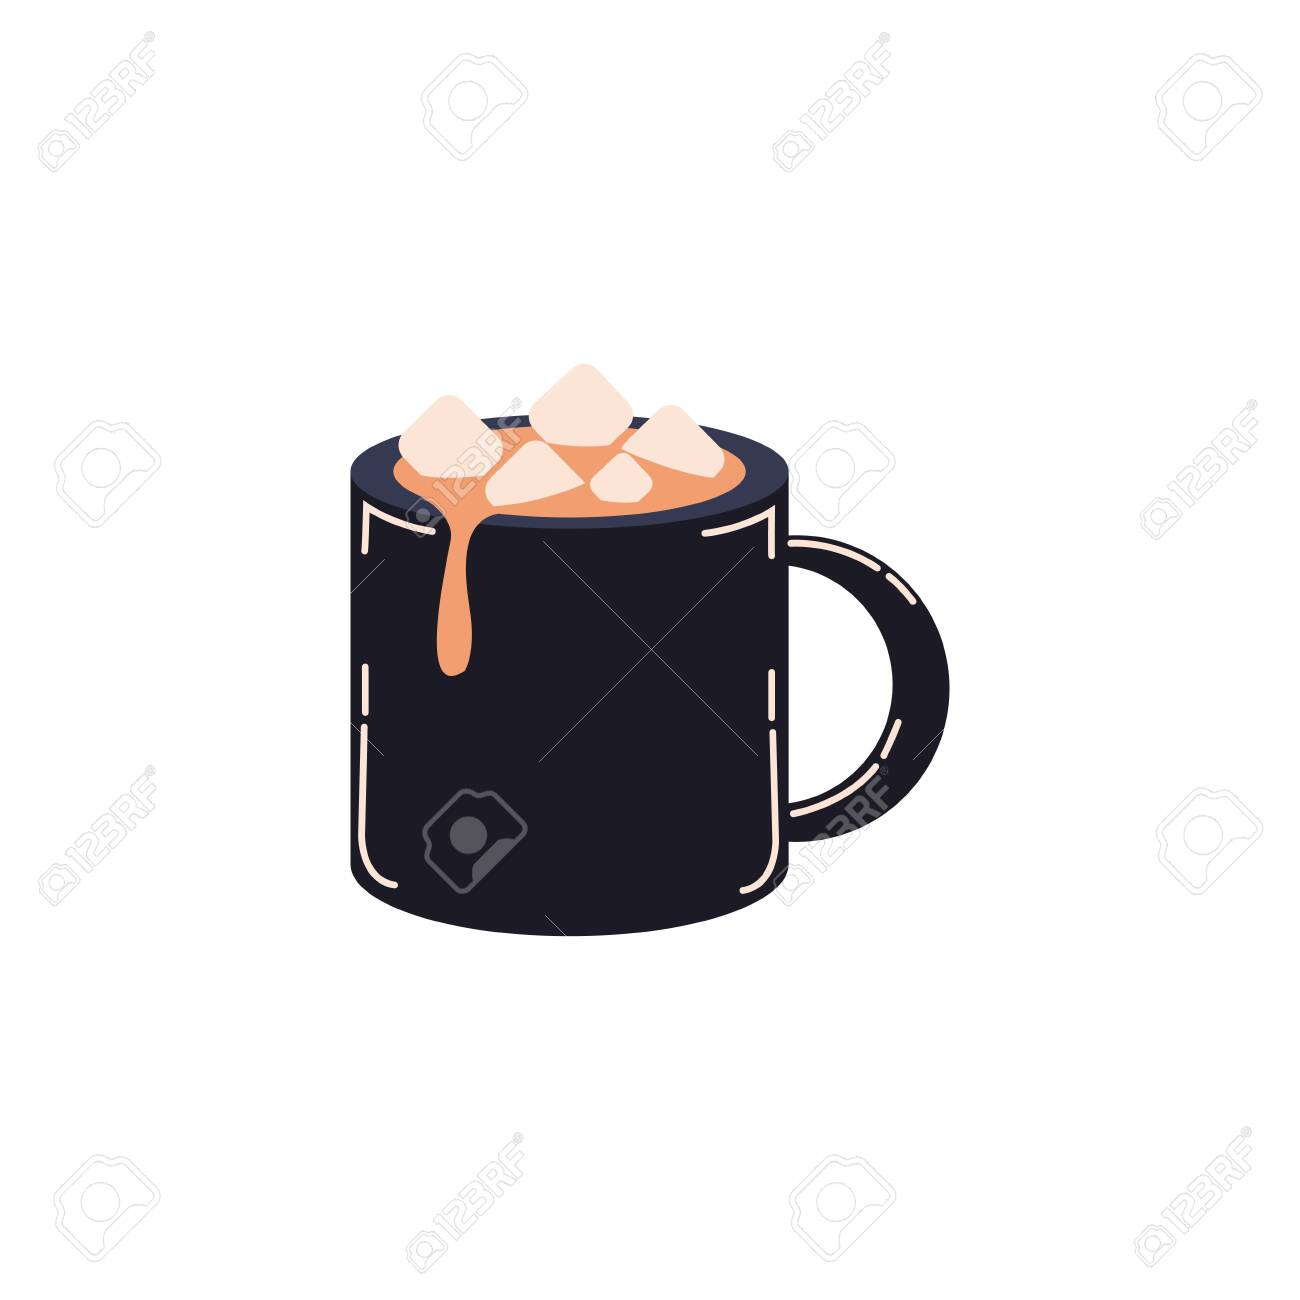 mug with chocolate beverage icon vector illustration design - 132661279